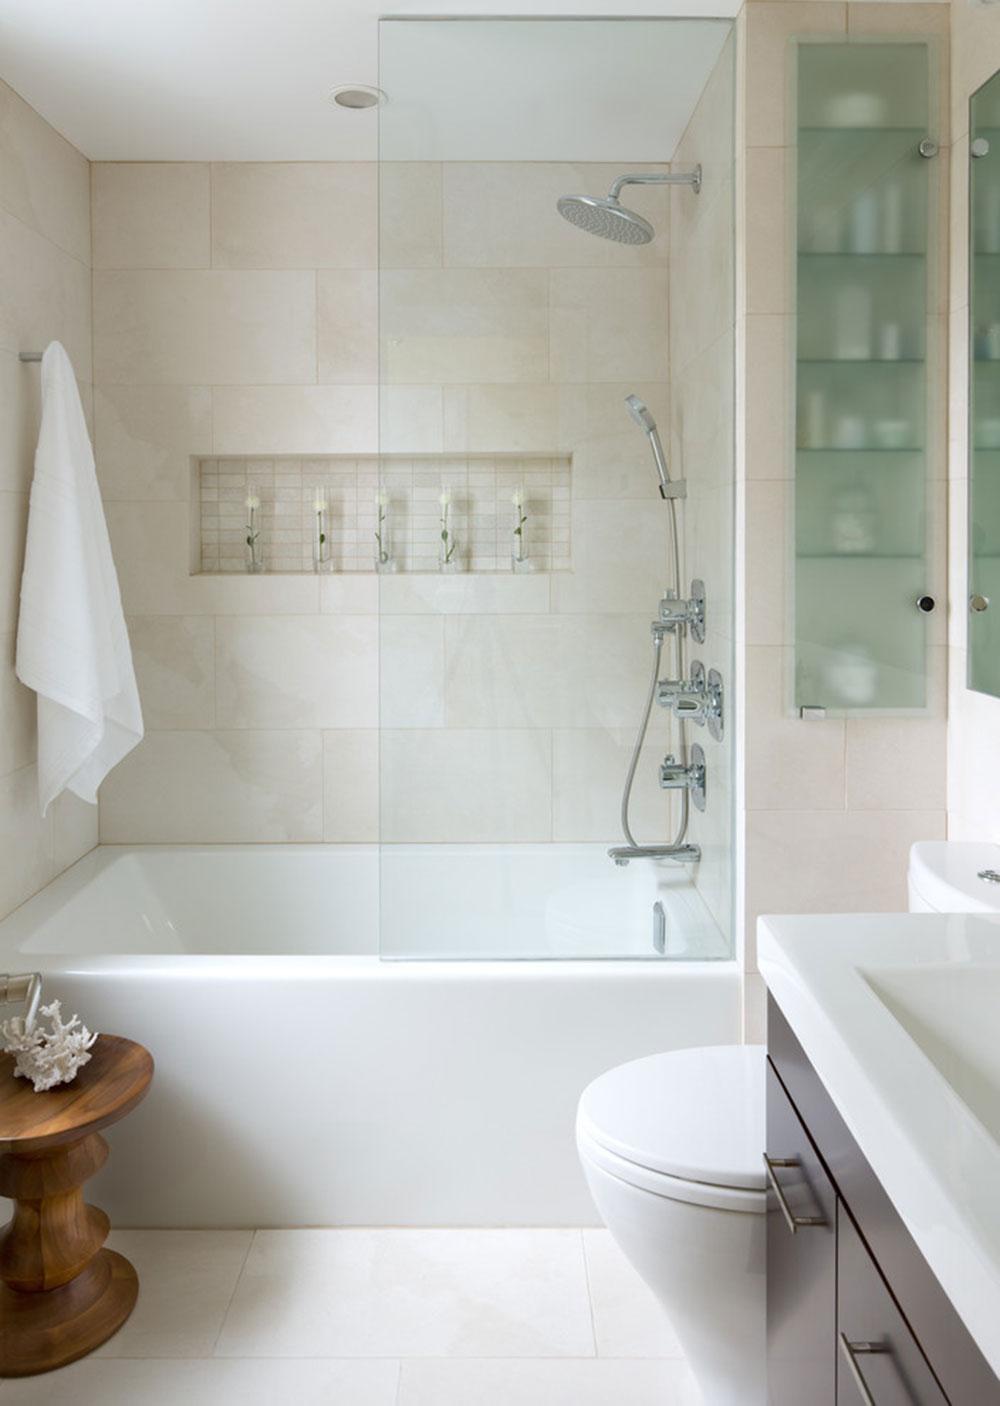 Small Bathroom Remodel Tips To Do It Properly Impressive Interior Design